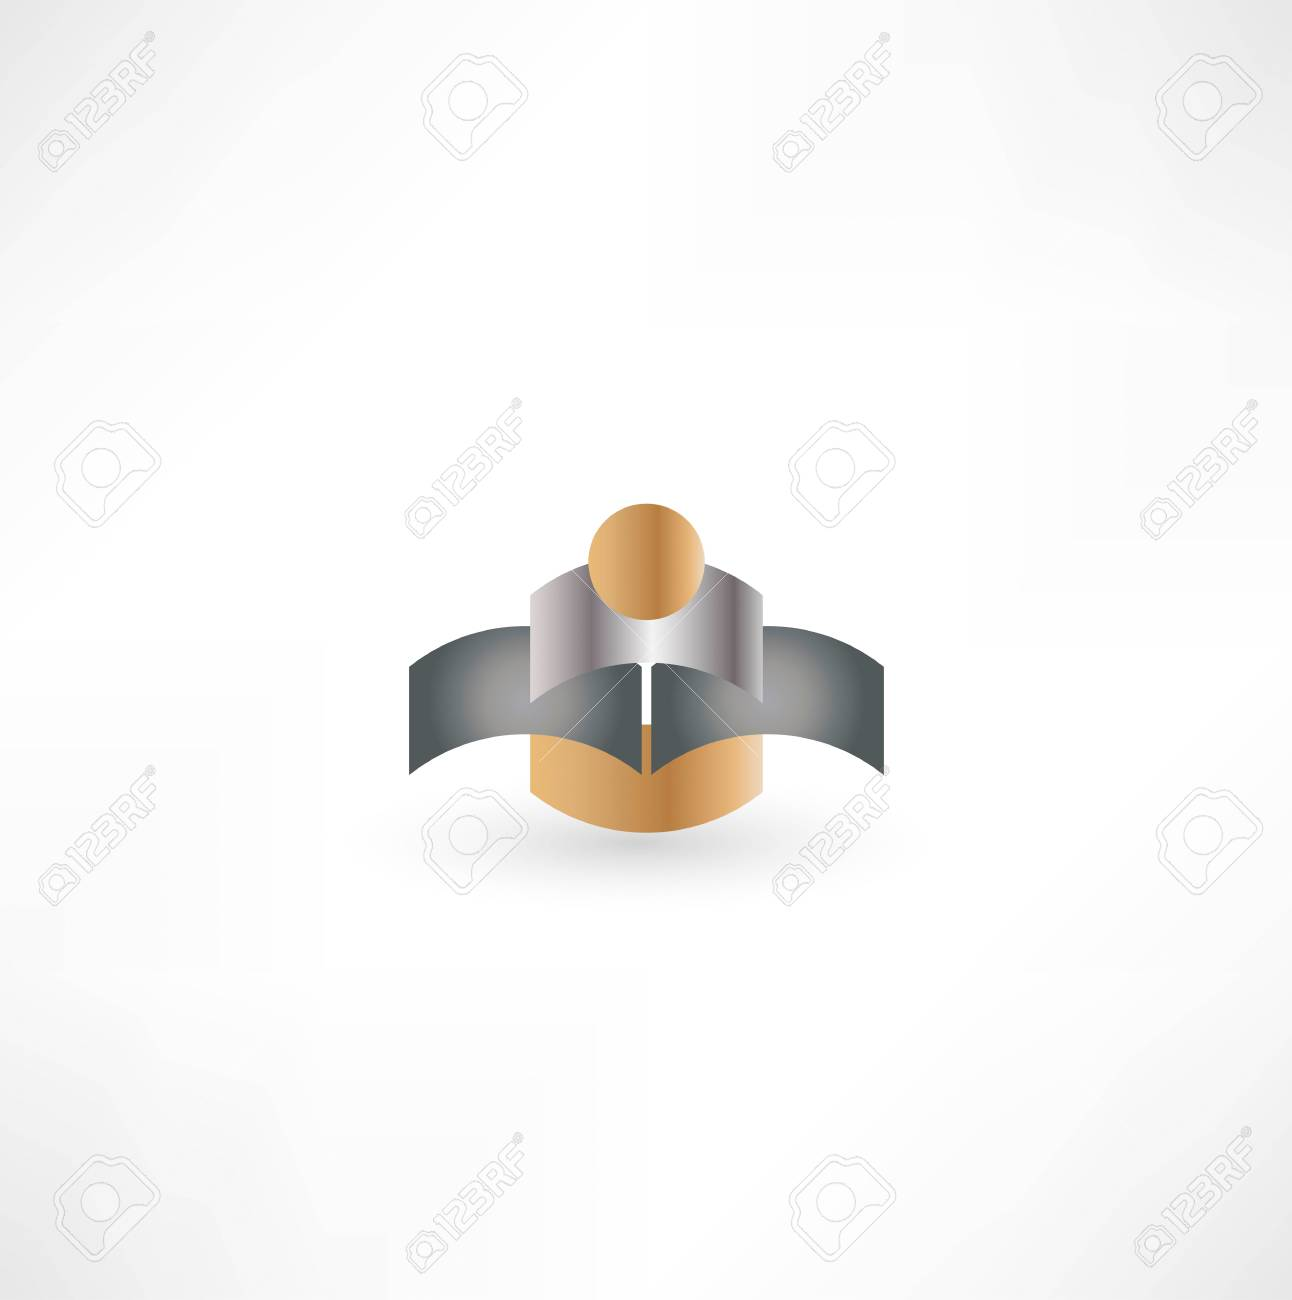 Business Design element Stock Vector - 15879642